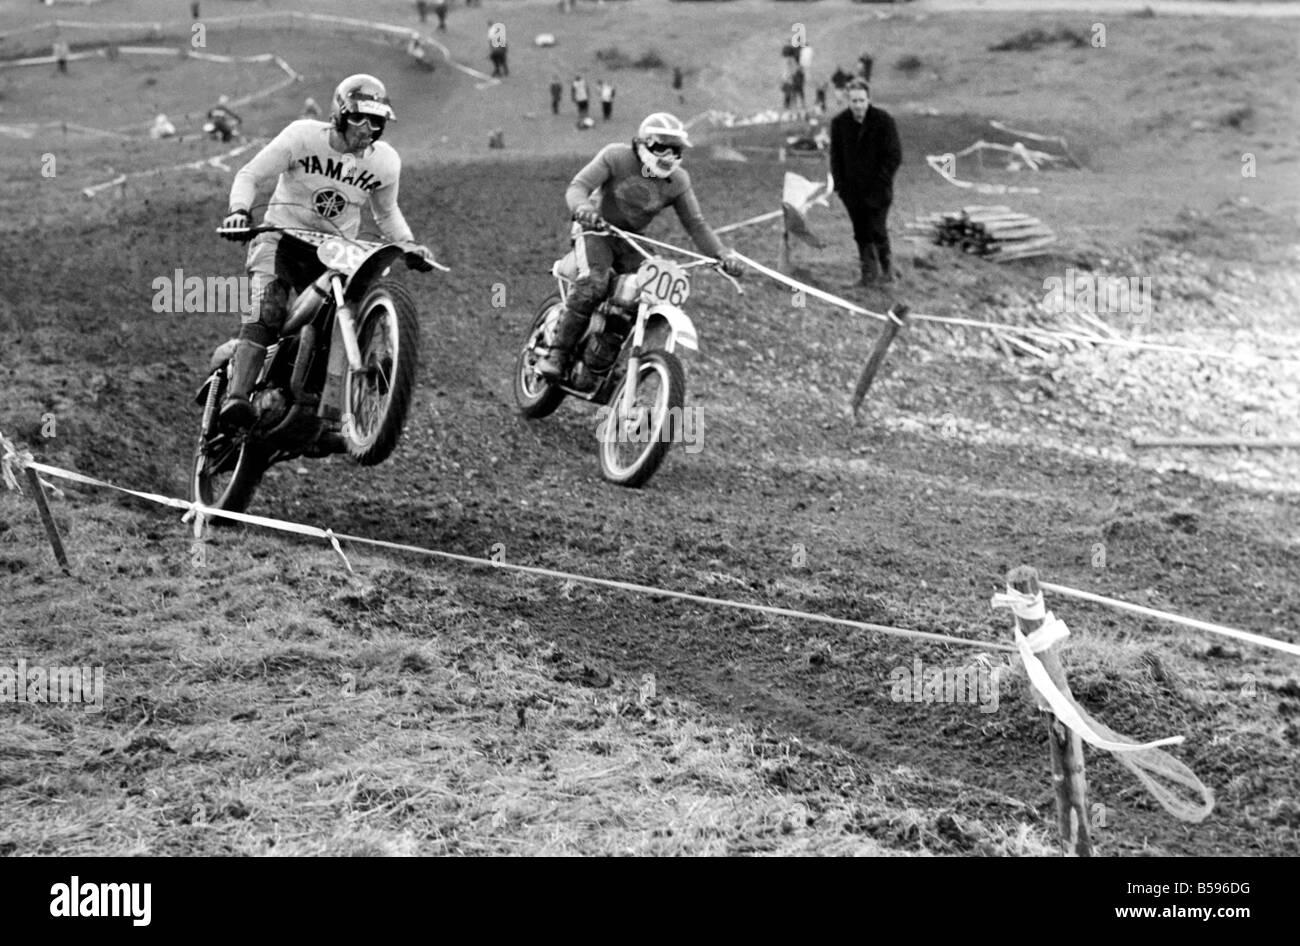 Motorsport/Children/Motorbike: Schoolboys Scramble. March 1975 75-01212-013 - Stock Image